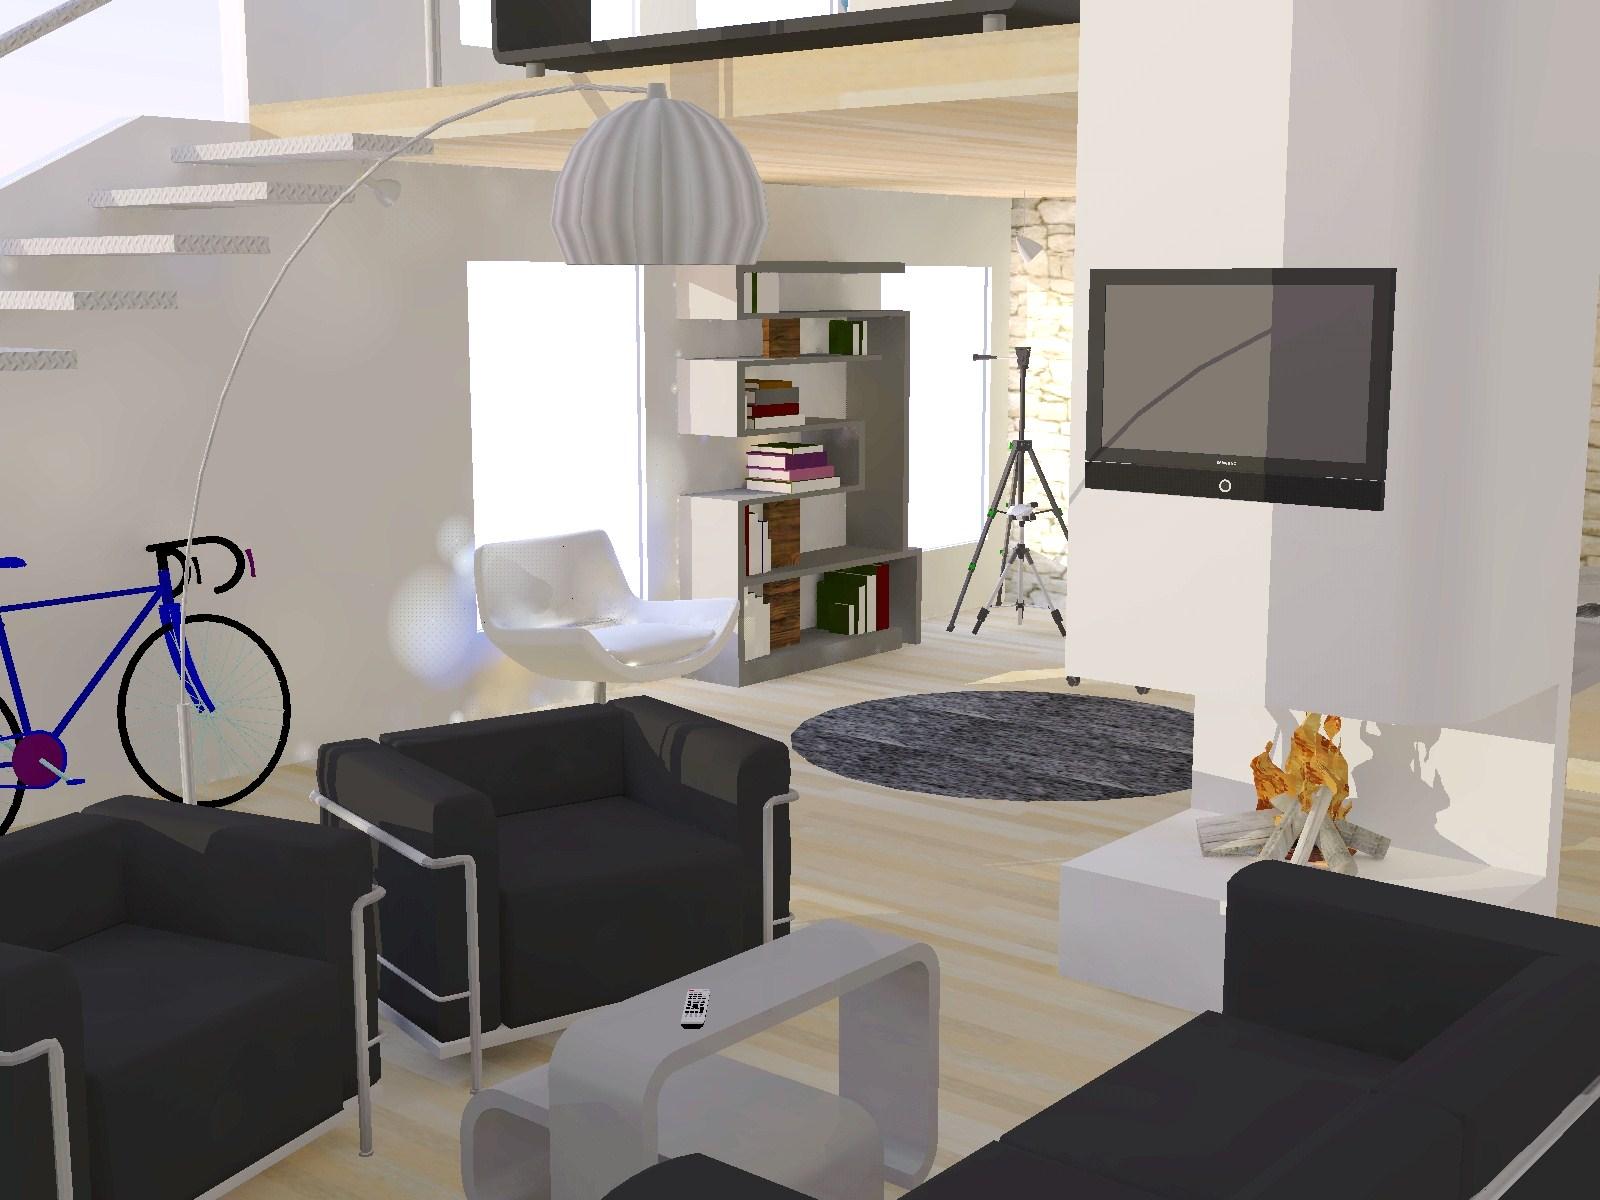 Decotweet proyecto dise a tu cuarto for Disena tu habitacion online